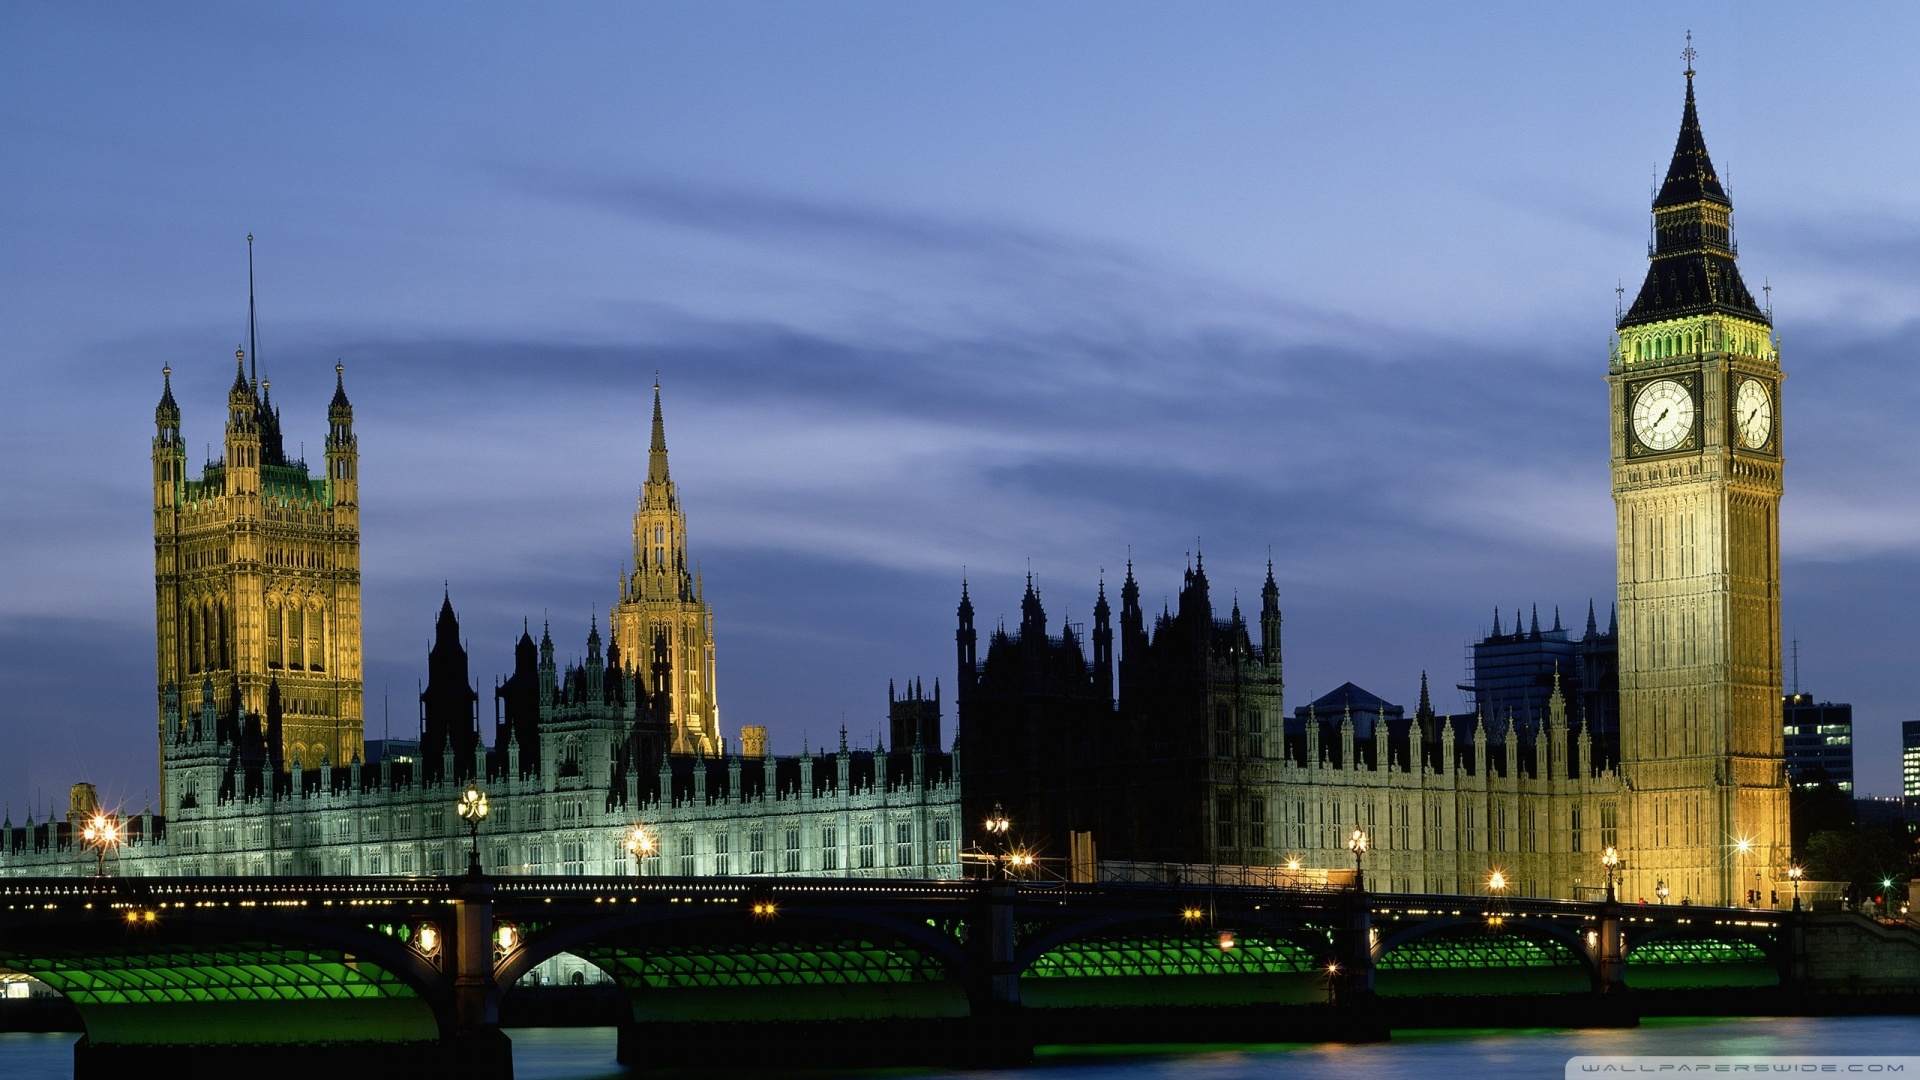 Houses Of Parliament And Big Ben London Uk Europe Wallpaper 1920x1080 ...